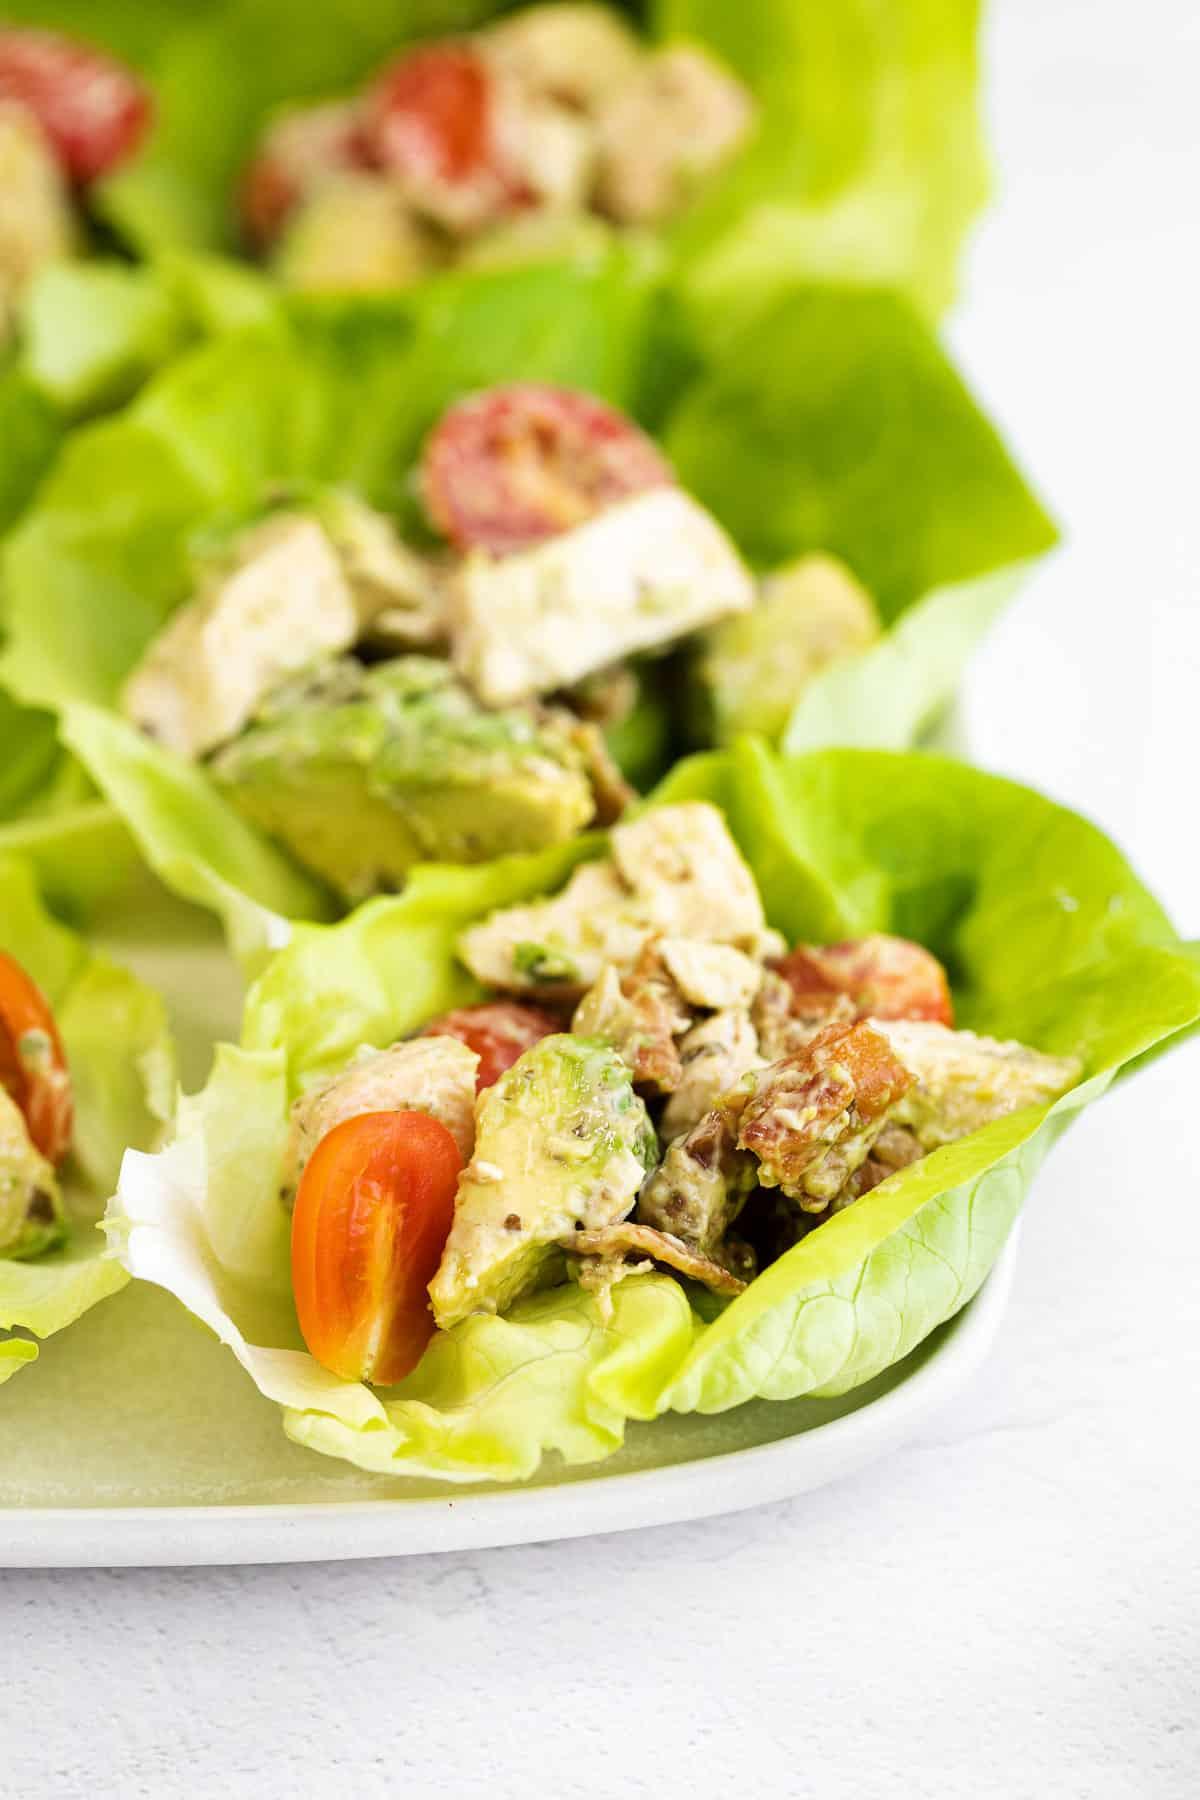 lettuce wraps with pesto chicken salad - pesto, chicken, tomato, avocado, mayo, and pesto